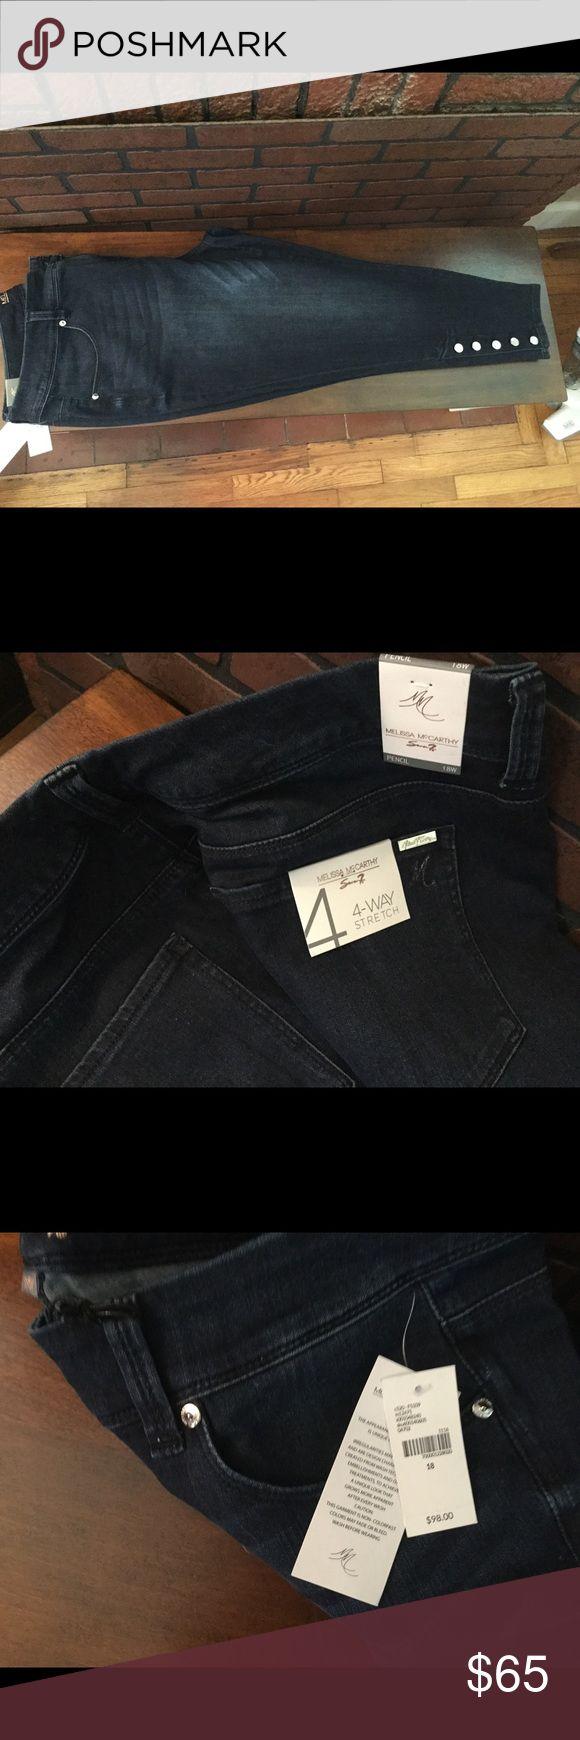 Seven Melissa McCarthy pencil jeans Brand new with tags Seven Melissa McCarthy jeans, purchased at Lane Bryant. Beautiful button detail on legs Melissa McCarthy Seven7 Jeans Skinny